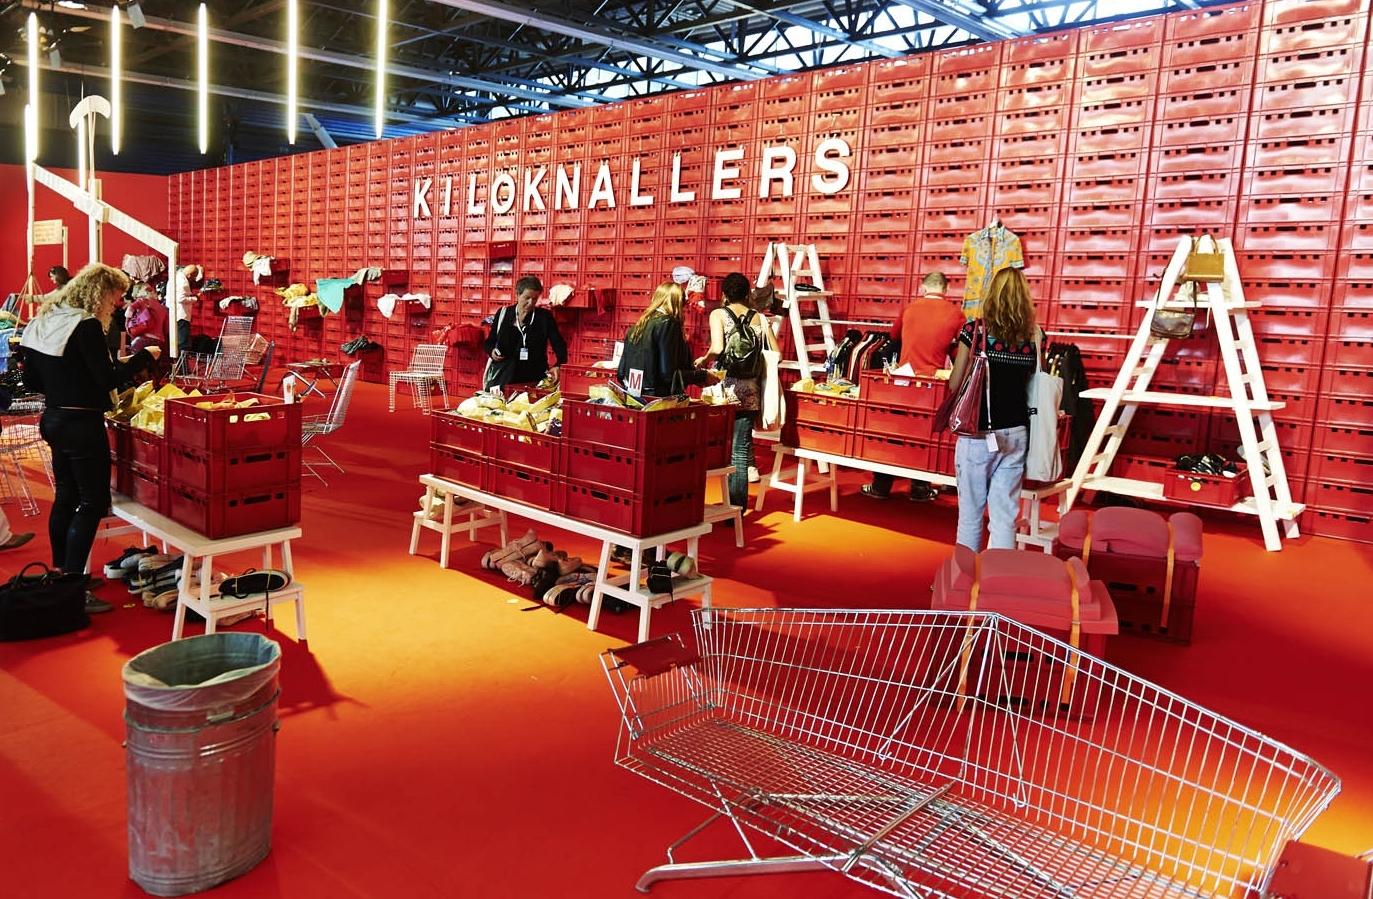 kiloknallers - modefabriek 13 07 by RVDA 1996.jpg